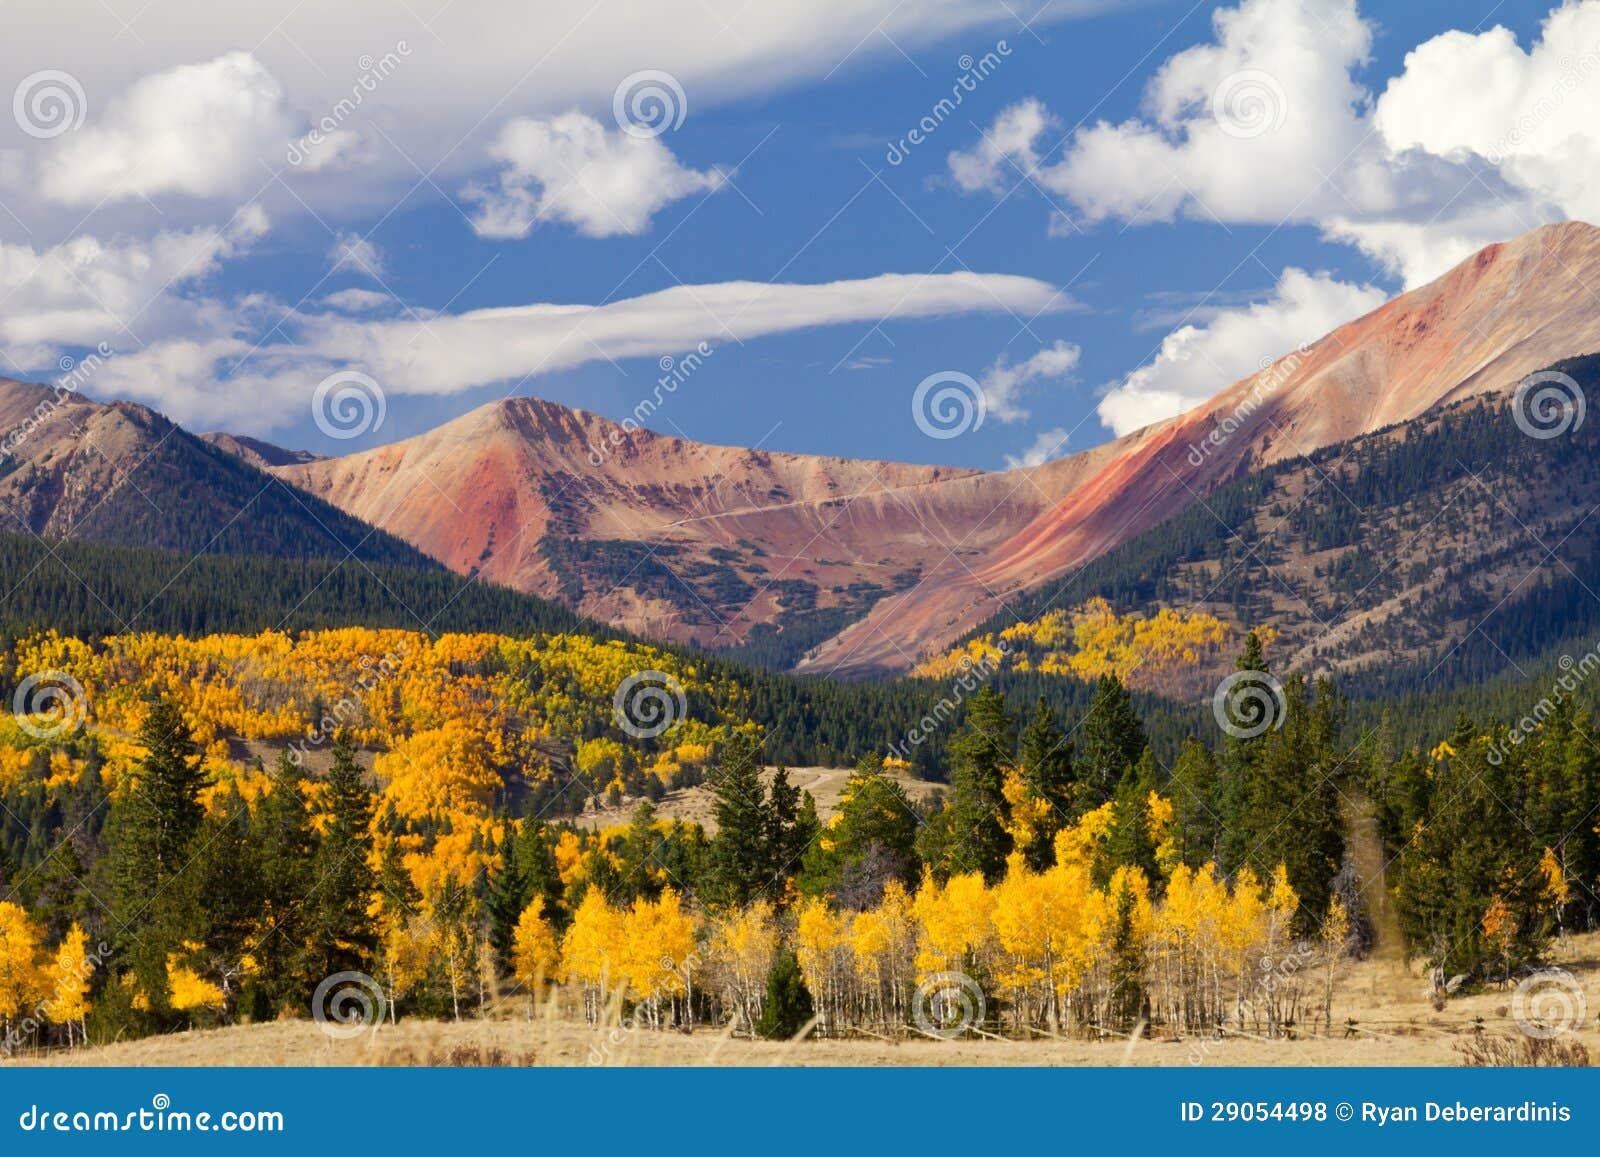 Colorado Mountain Landscape with Fall Aspens